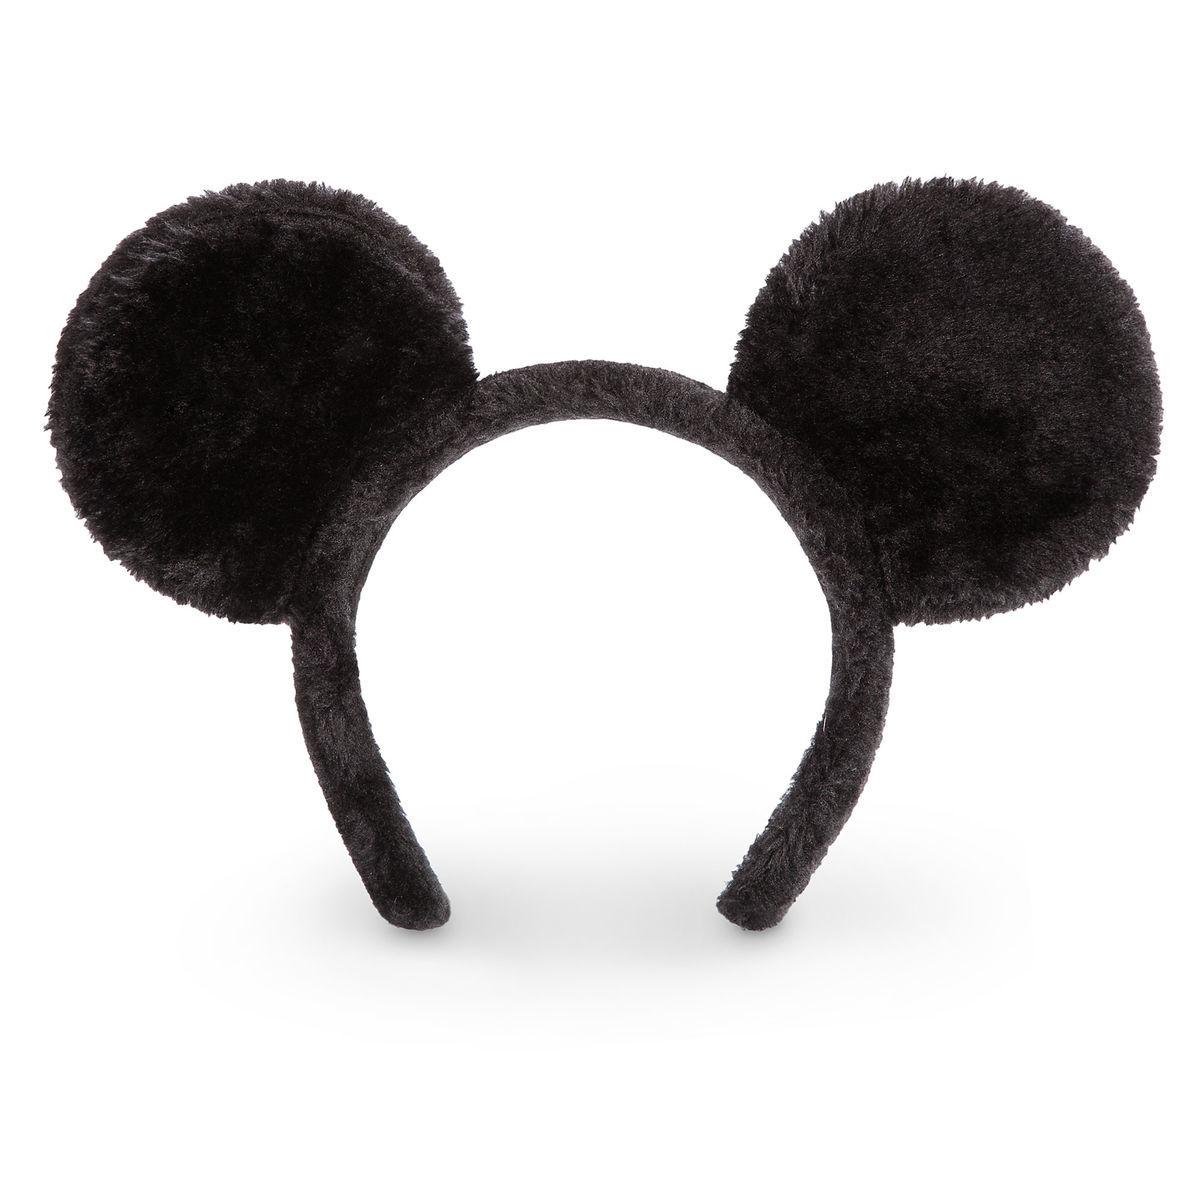 mickey mouse ear headband for adults shopdisney